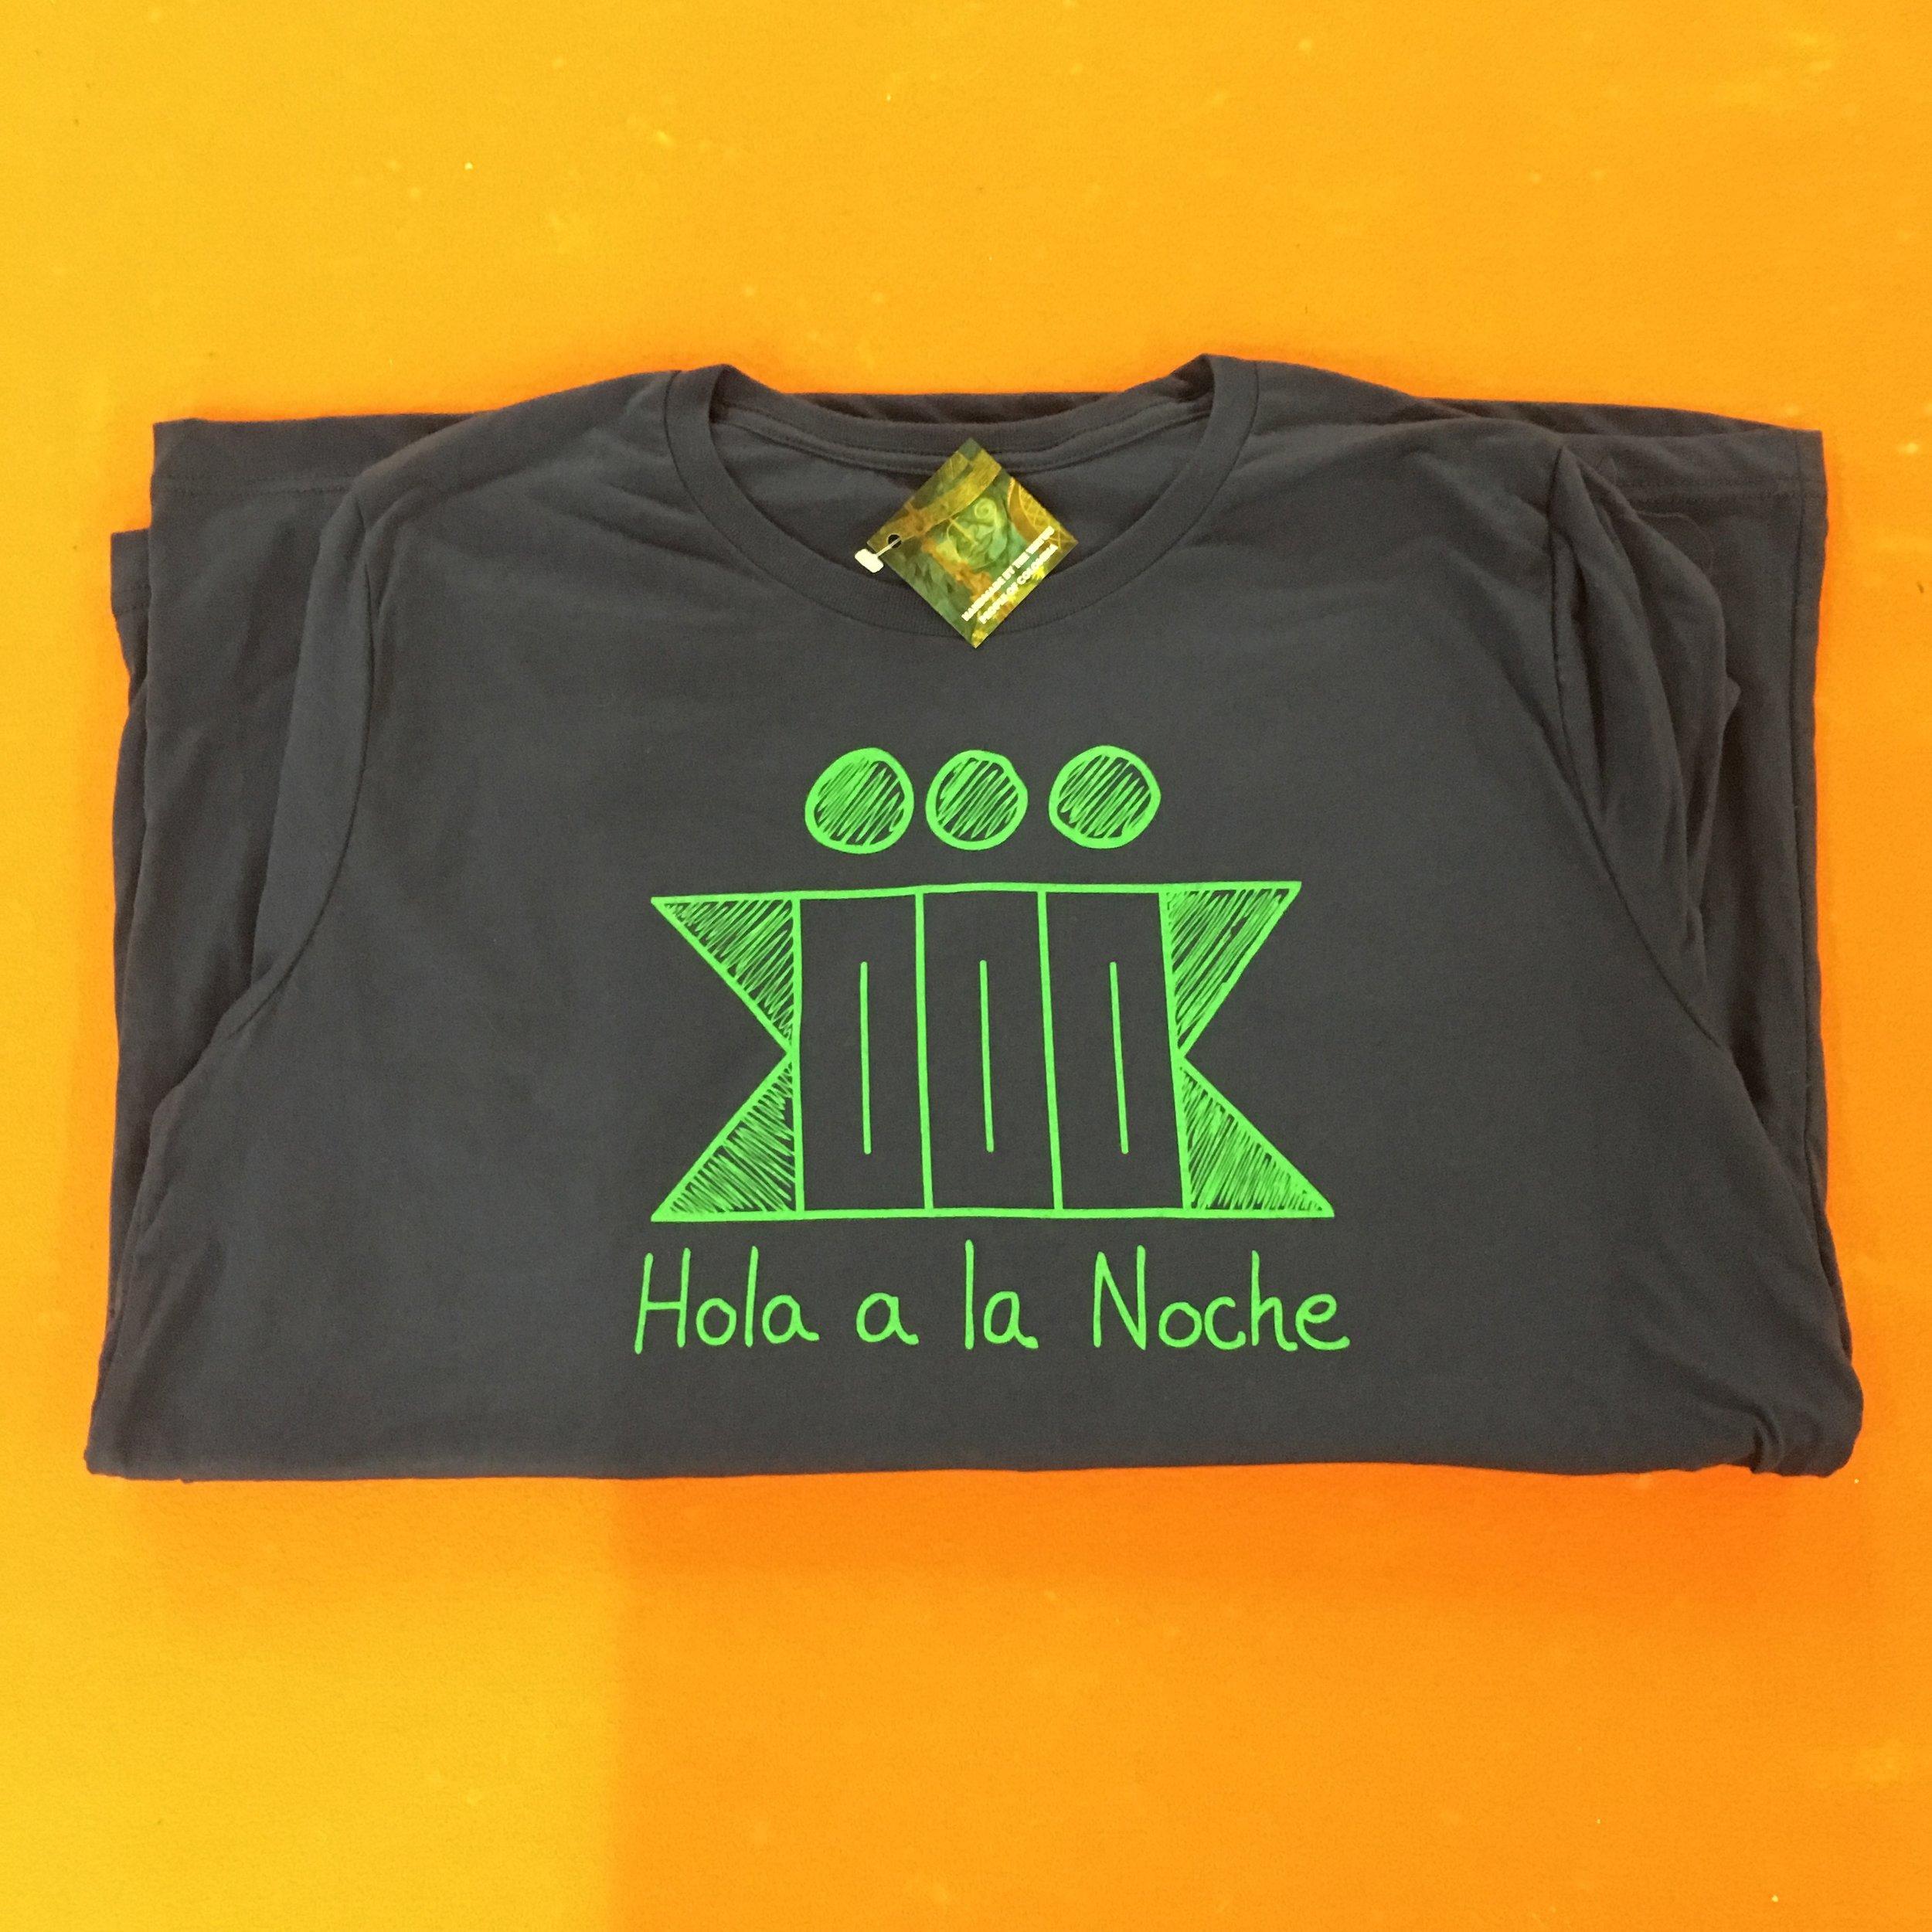 Hola a la Noche T-shirts